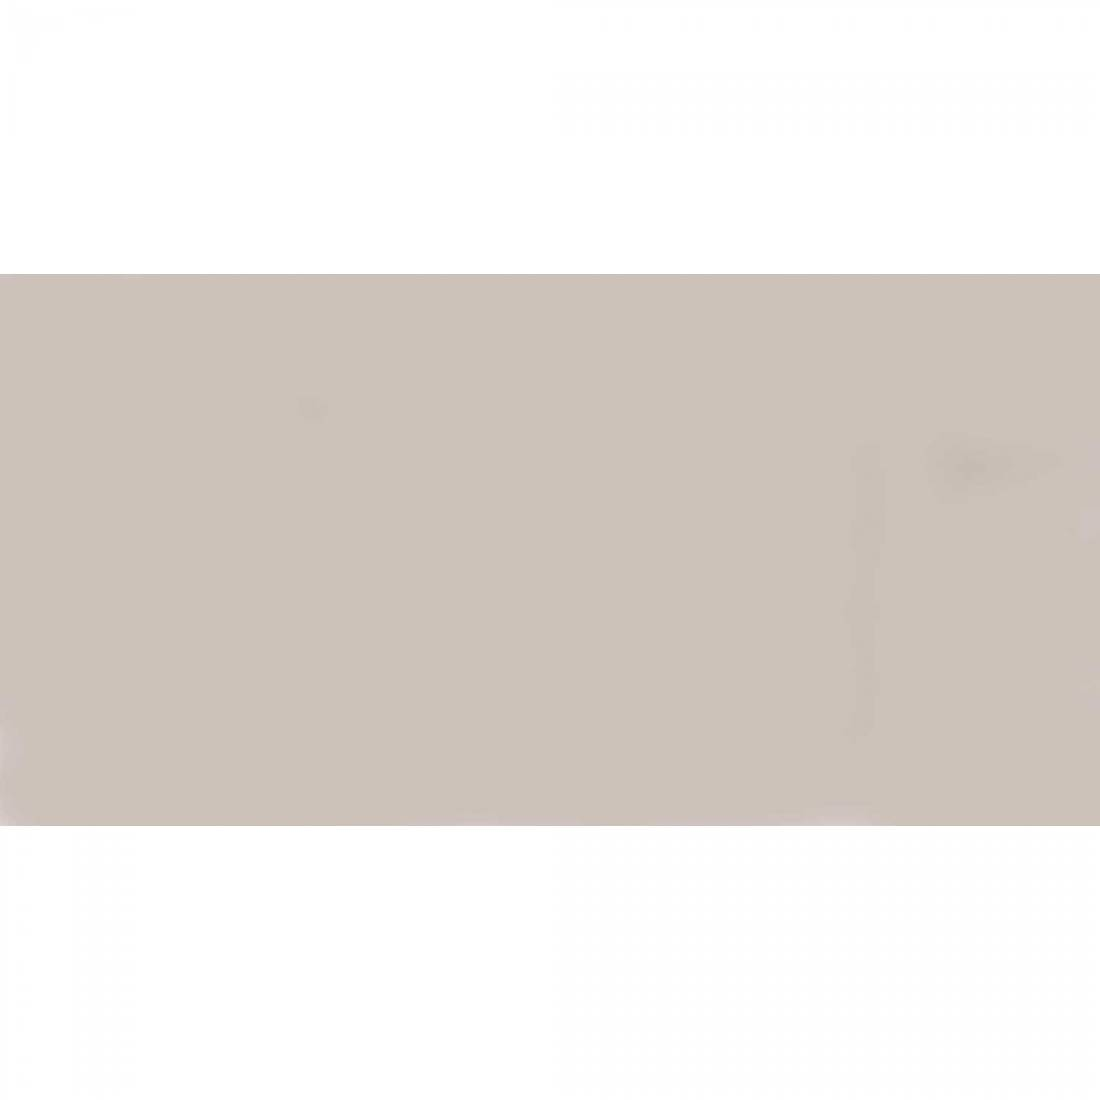 Desert 30x60 Pearl Gloss 1